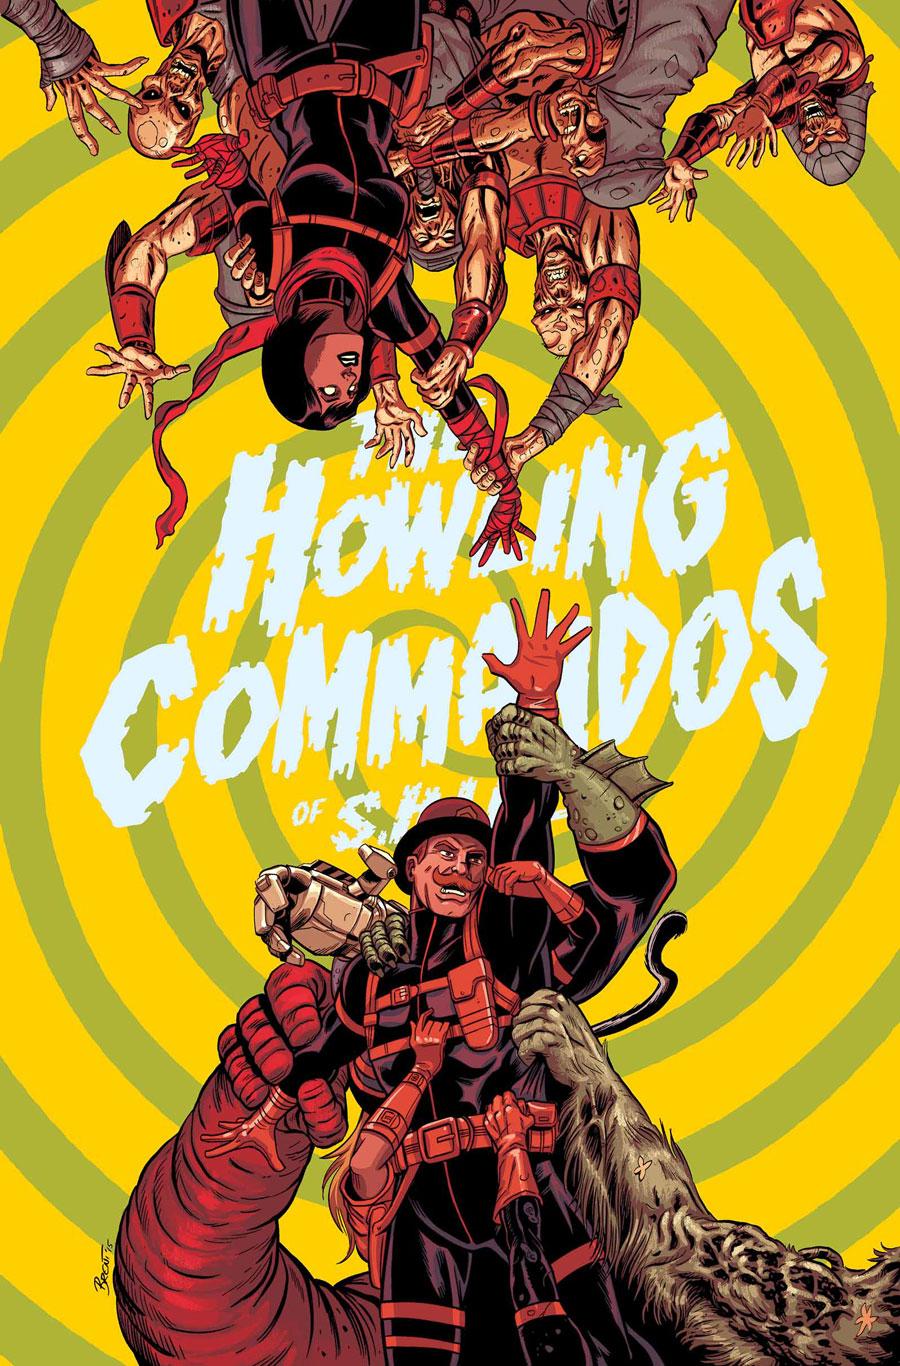 Howling Commandos of S.H.I.E.L.D. Vol 1 5 Textless.jpg